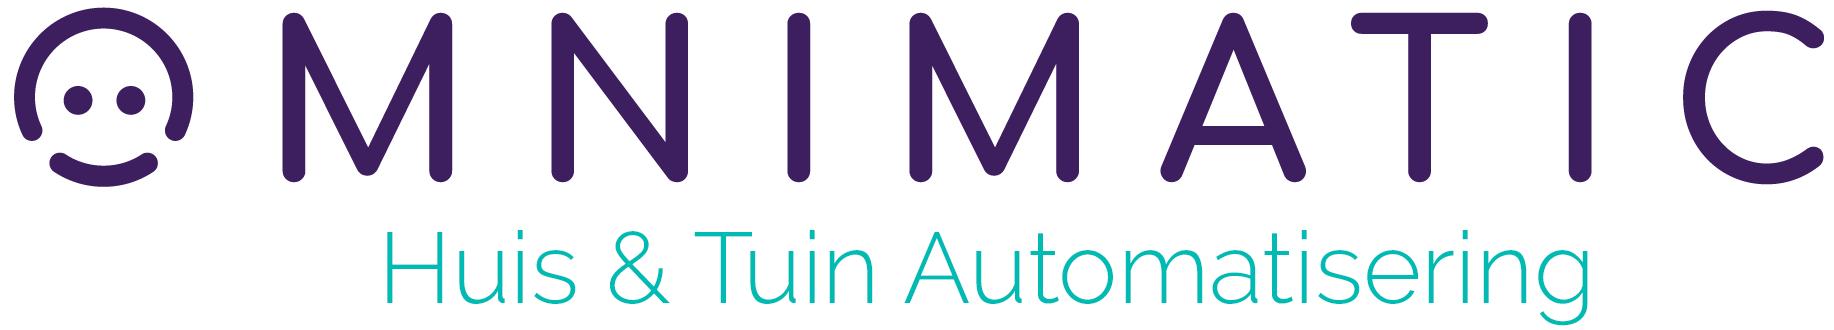 Omnimatic.nl - Huis & Tuin automatisering